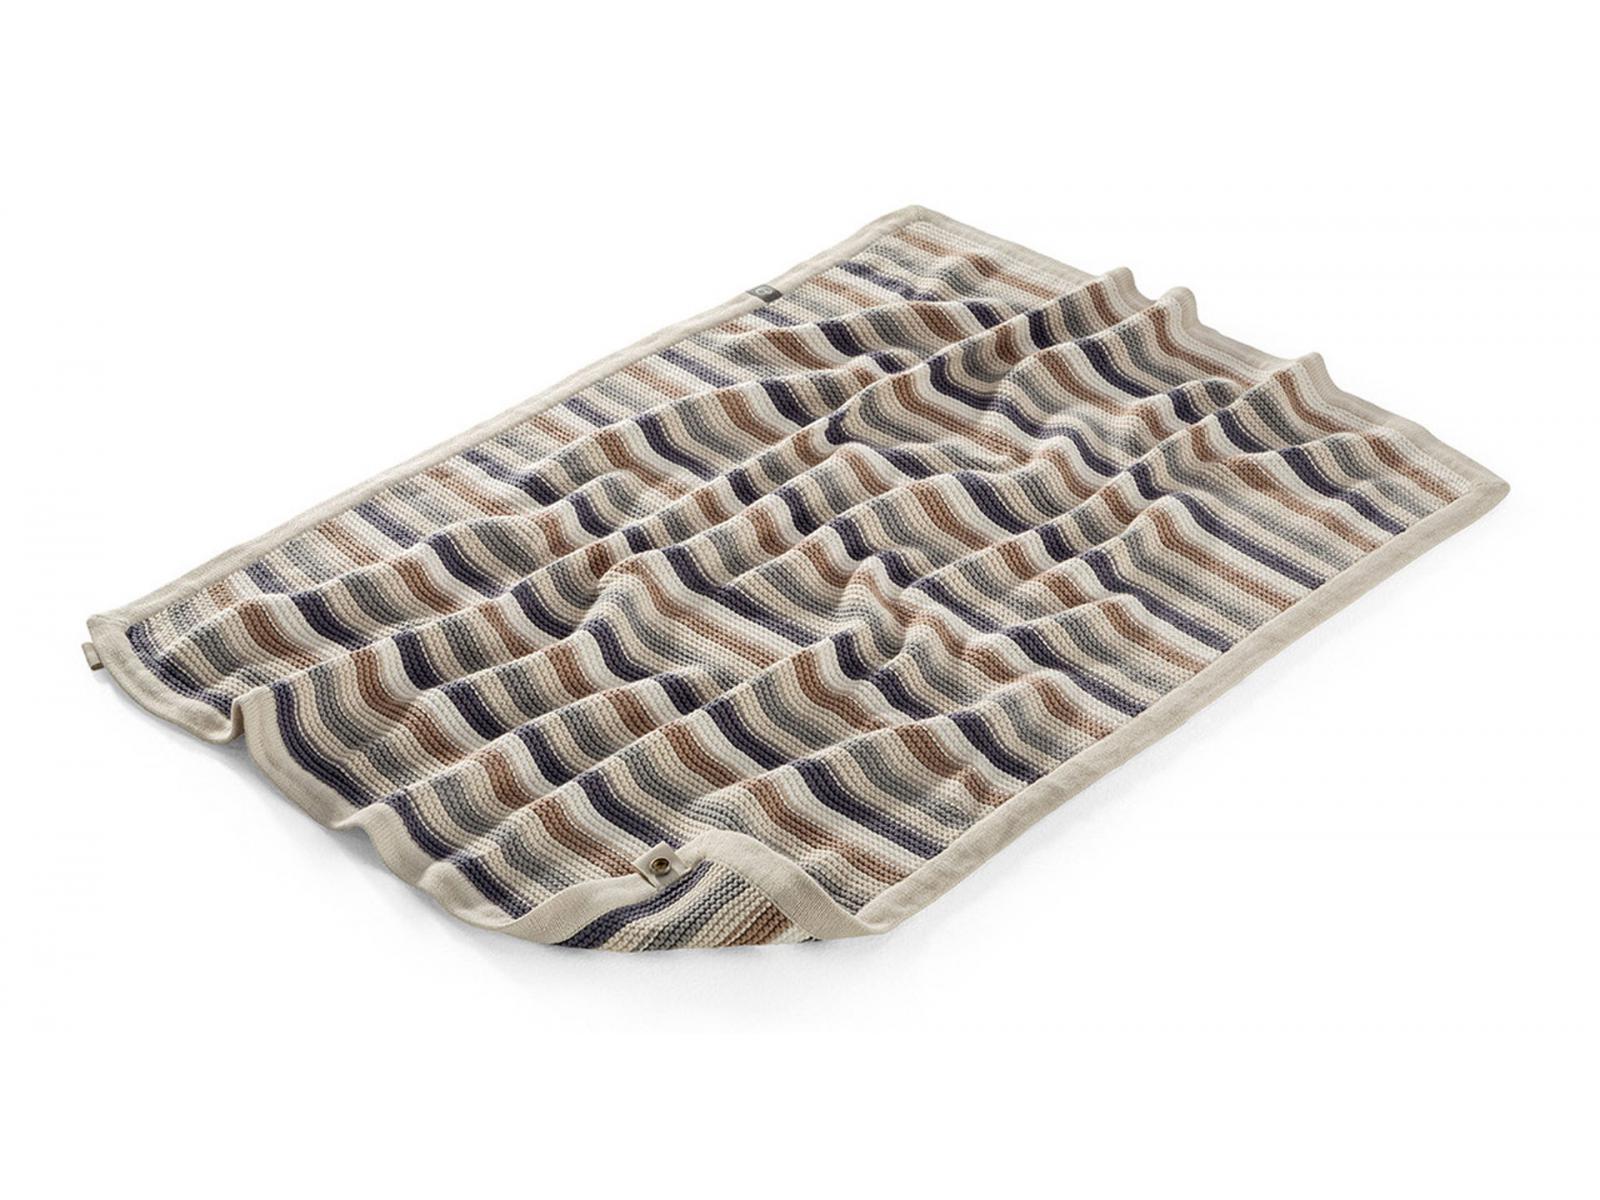 stokke couverture plaid en coton stokke horizon. Black Bedroom Furniture Sets. Home Design Ideas